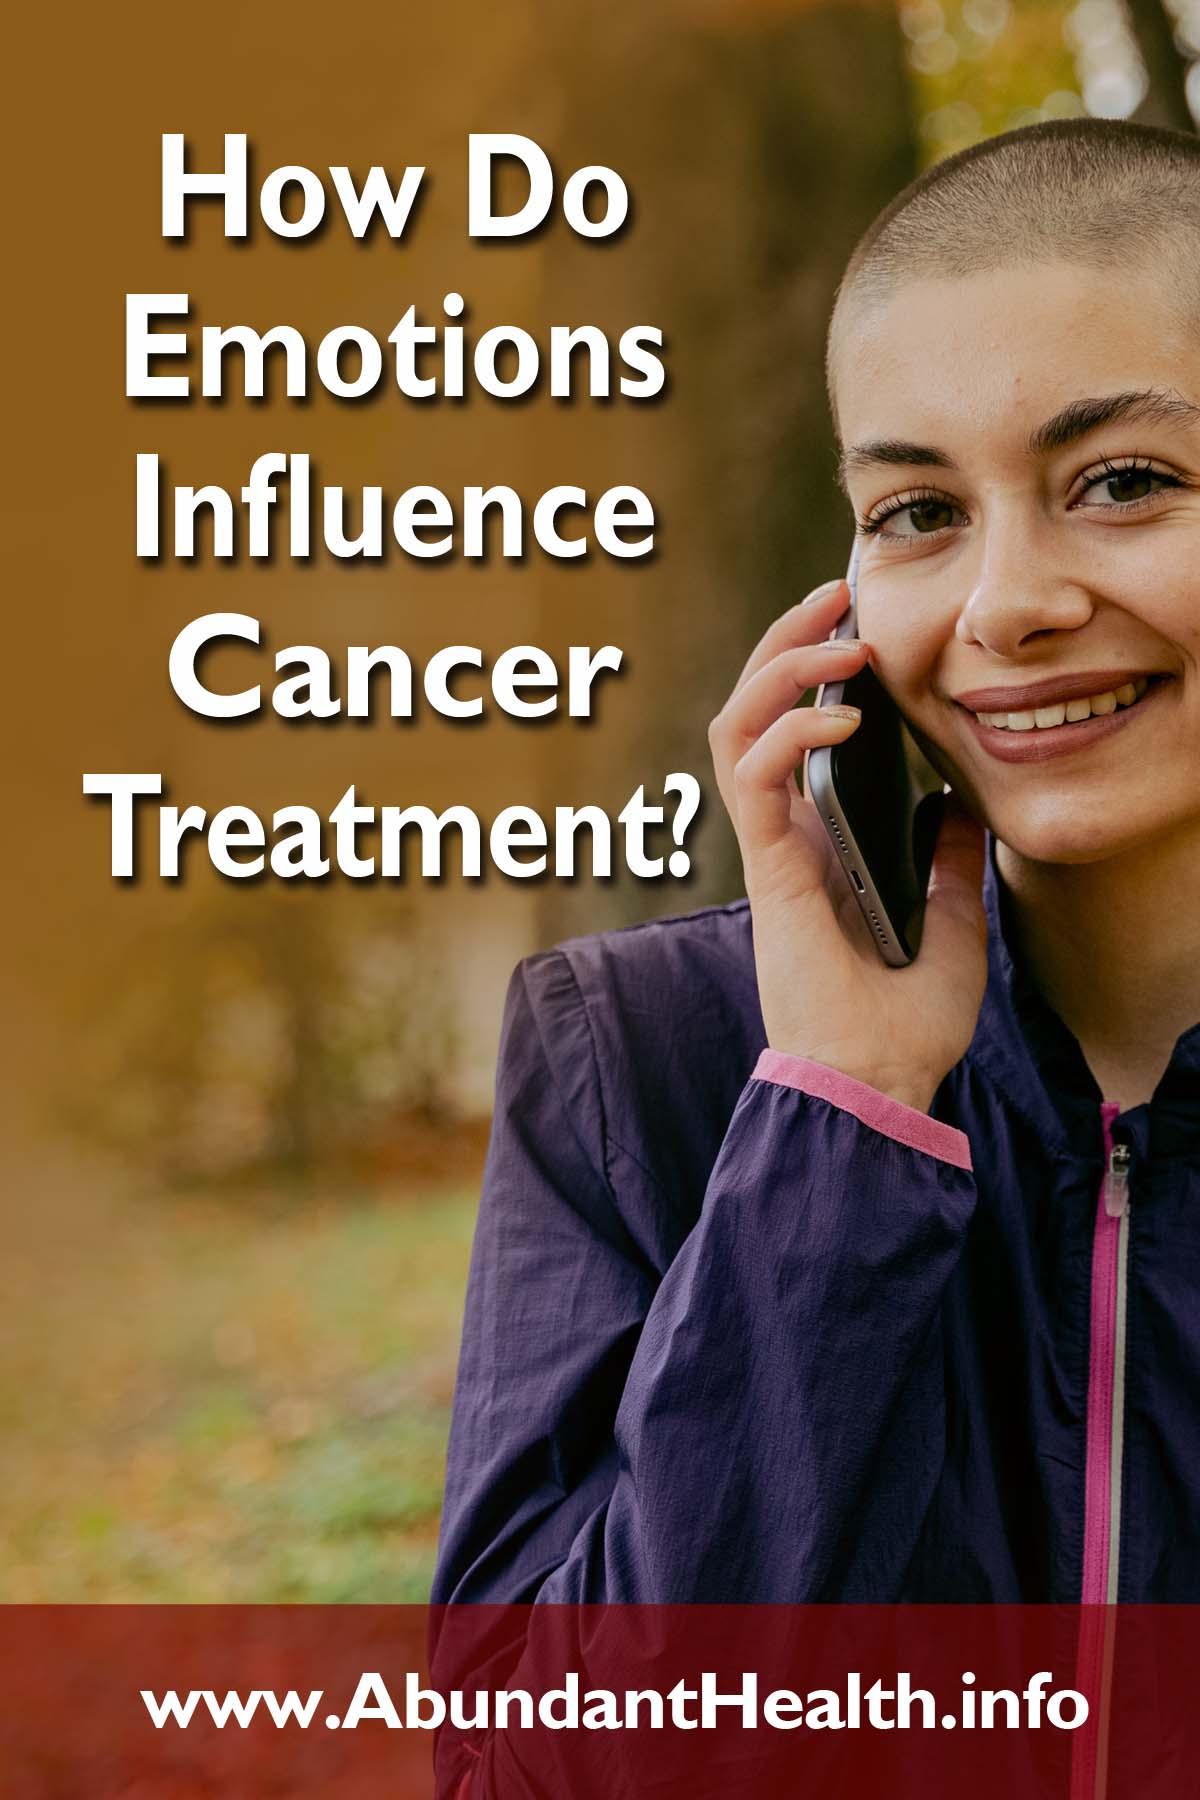 How Do Emotions Influence Cancer Treatment?